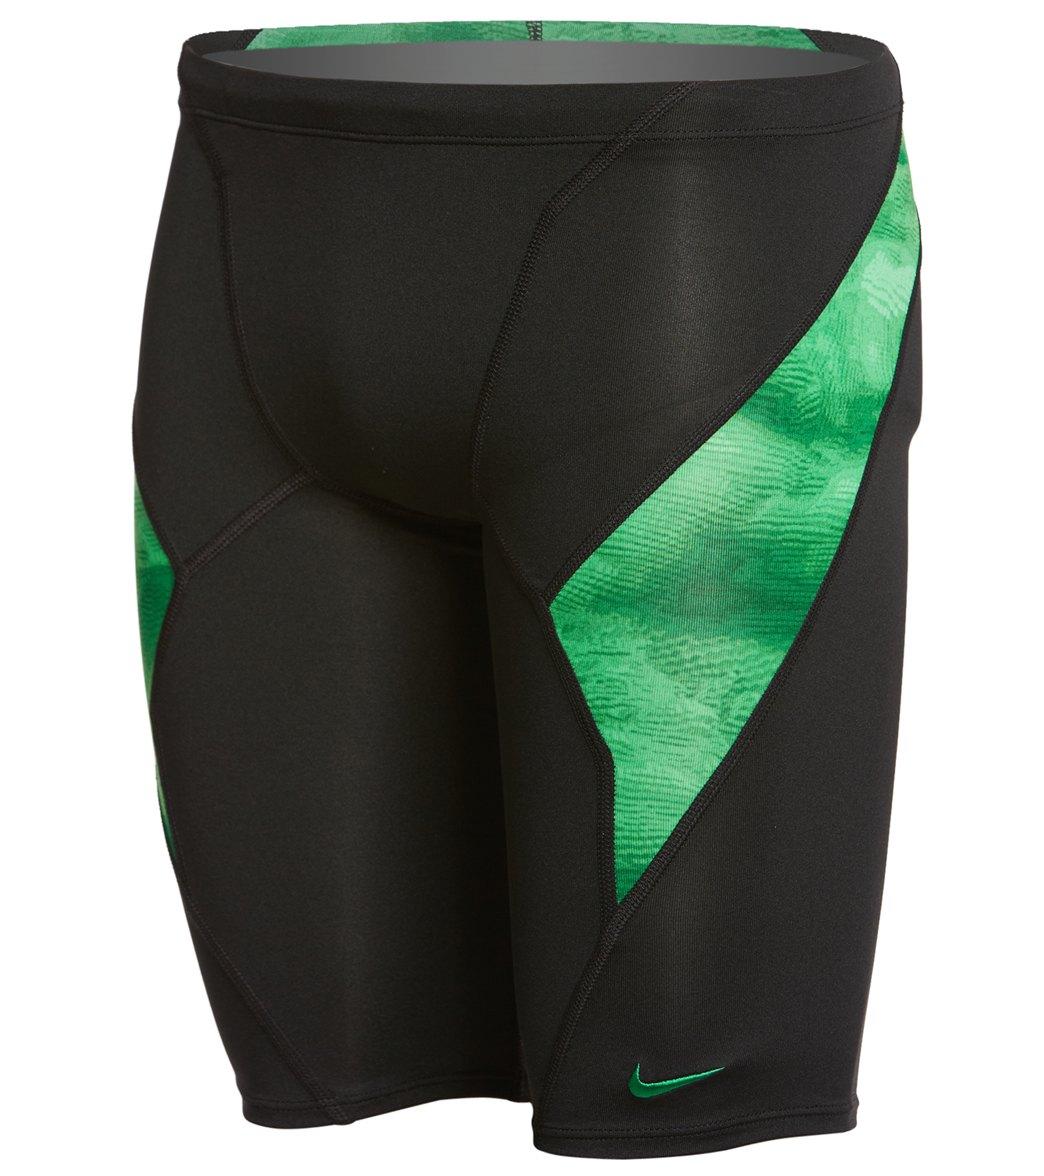 0a5f7d6968f7 Nike Men s Cloud Jammer Swimsuit at SwimOutlet.com